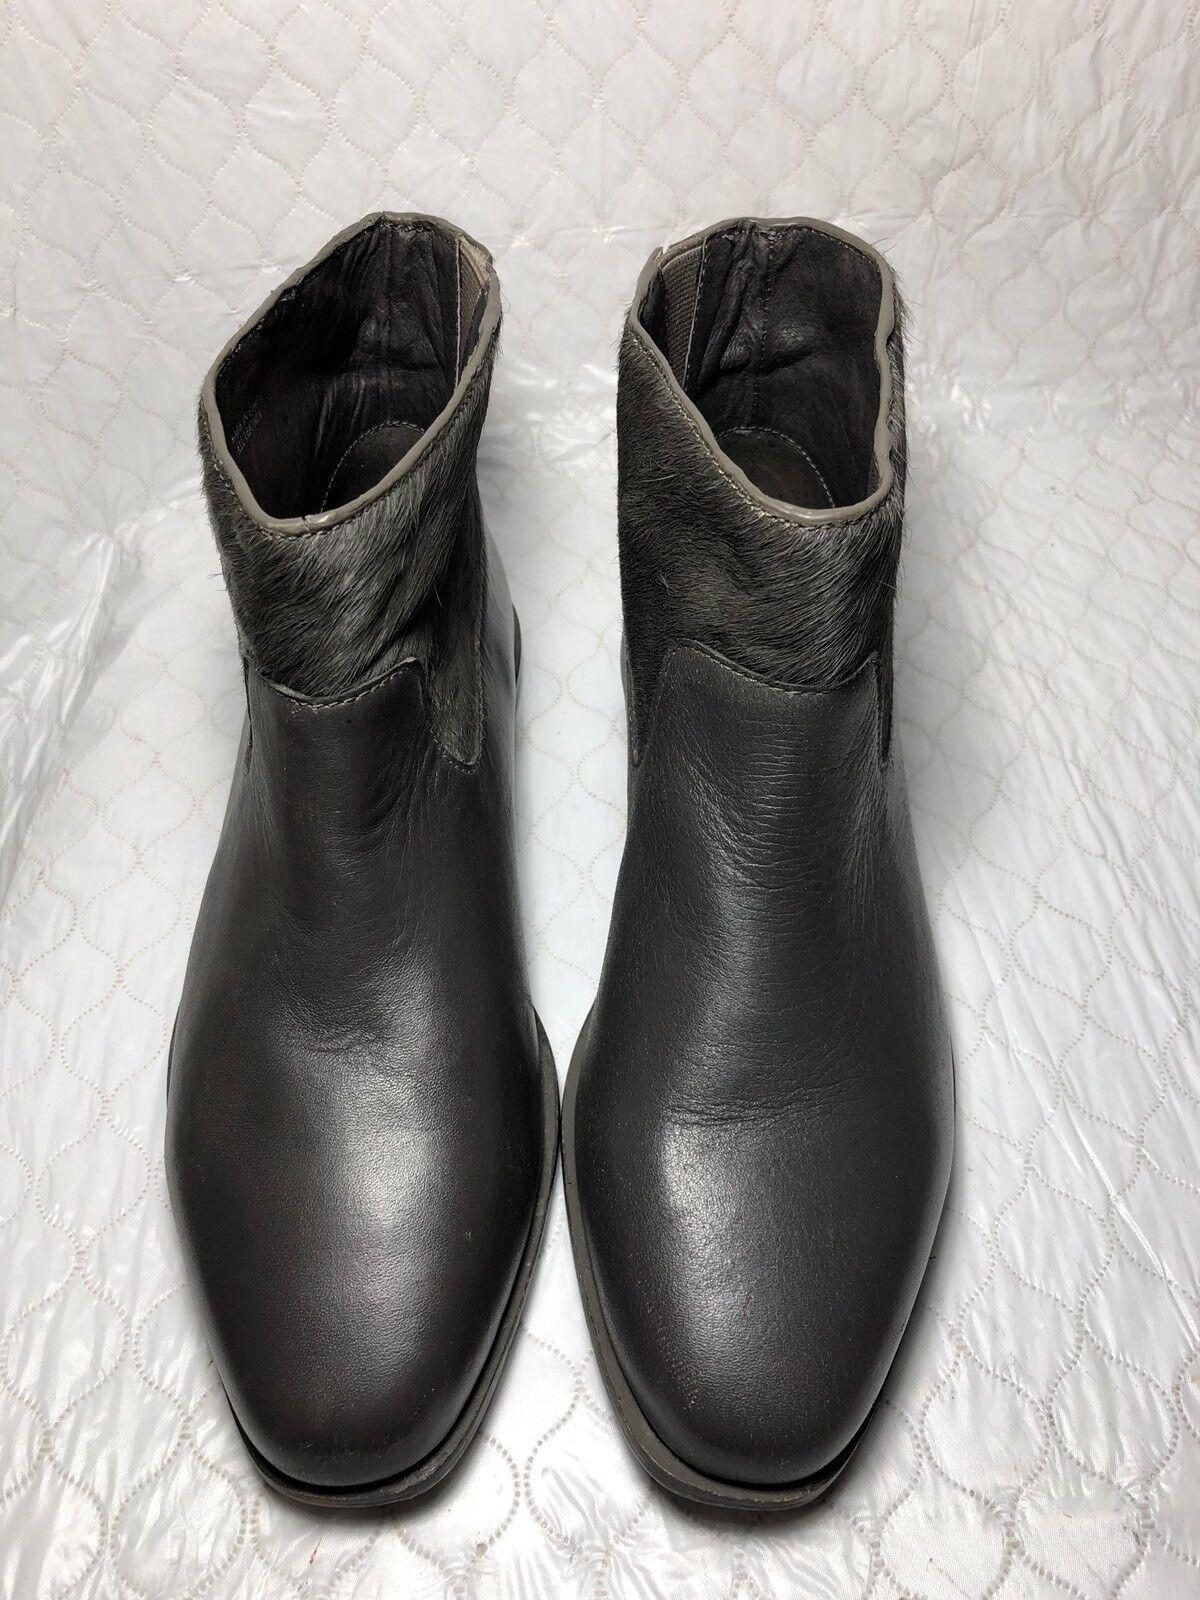 Saint & Libertine Trinket Grau Leder Calf Hair Ankle Stiefel NEU York Größe-8.5 M